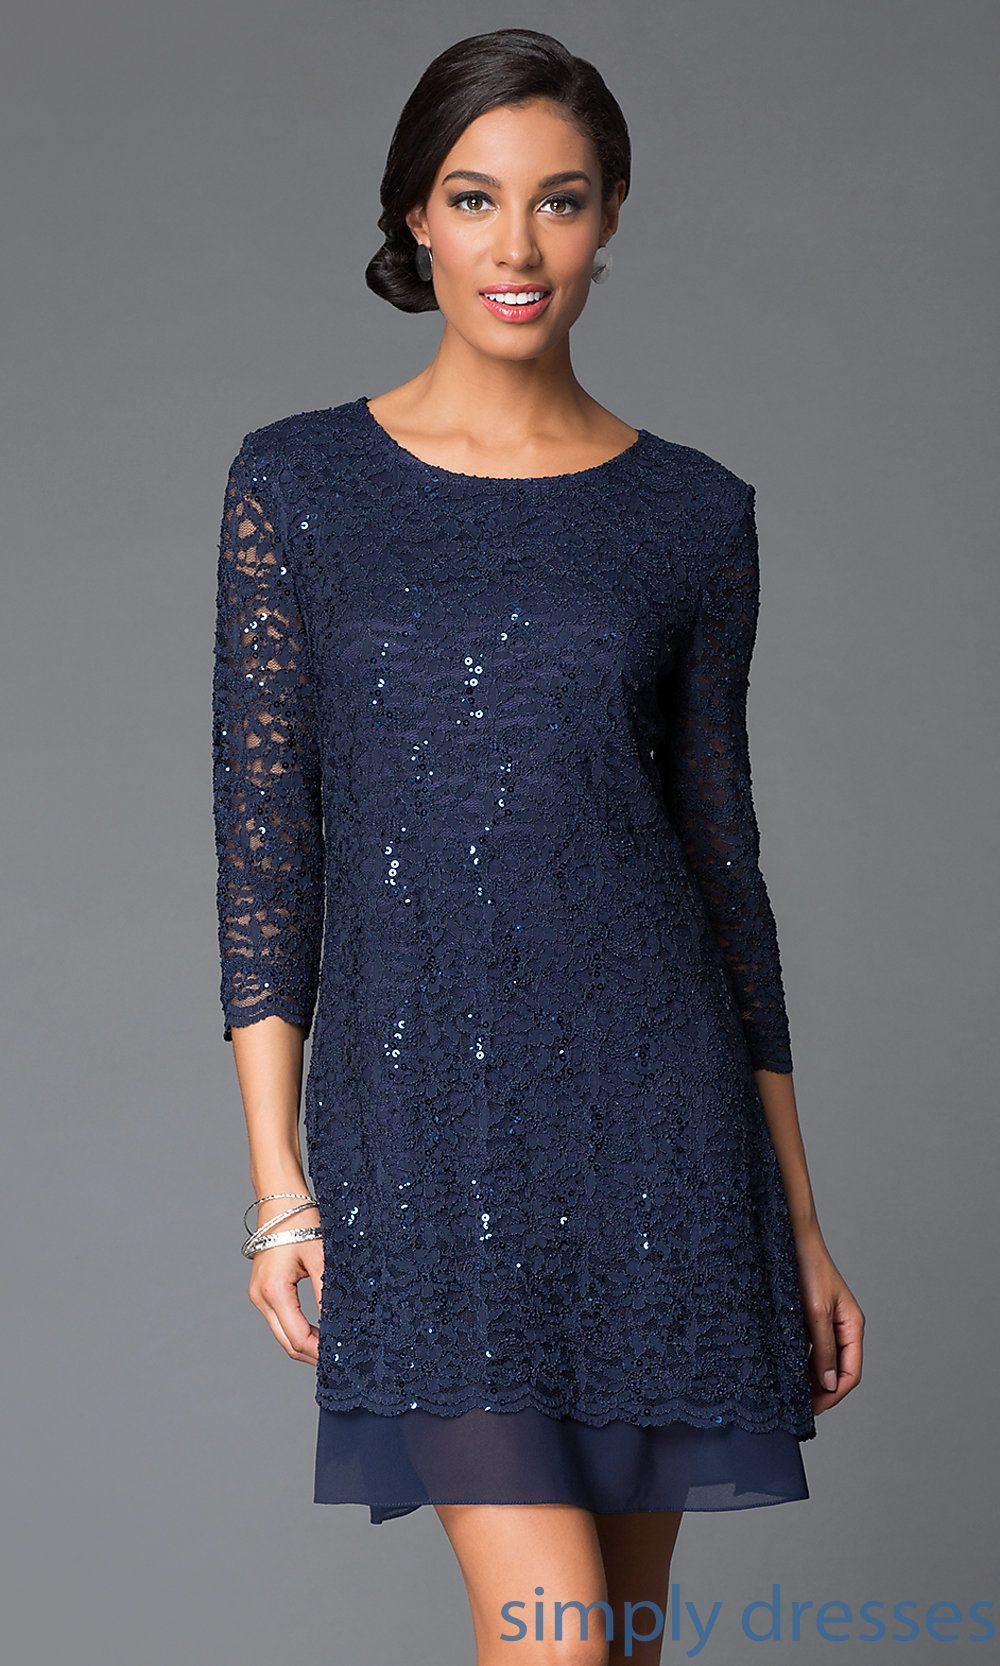 Shop Tiana B Three Quarter Sleeve Short Lace Dresses At